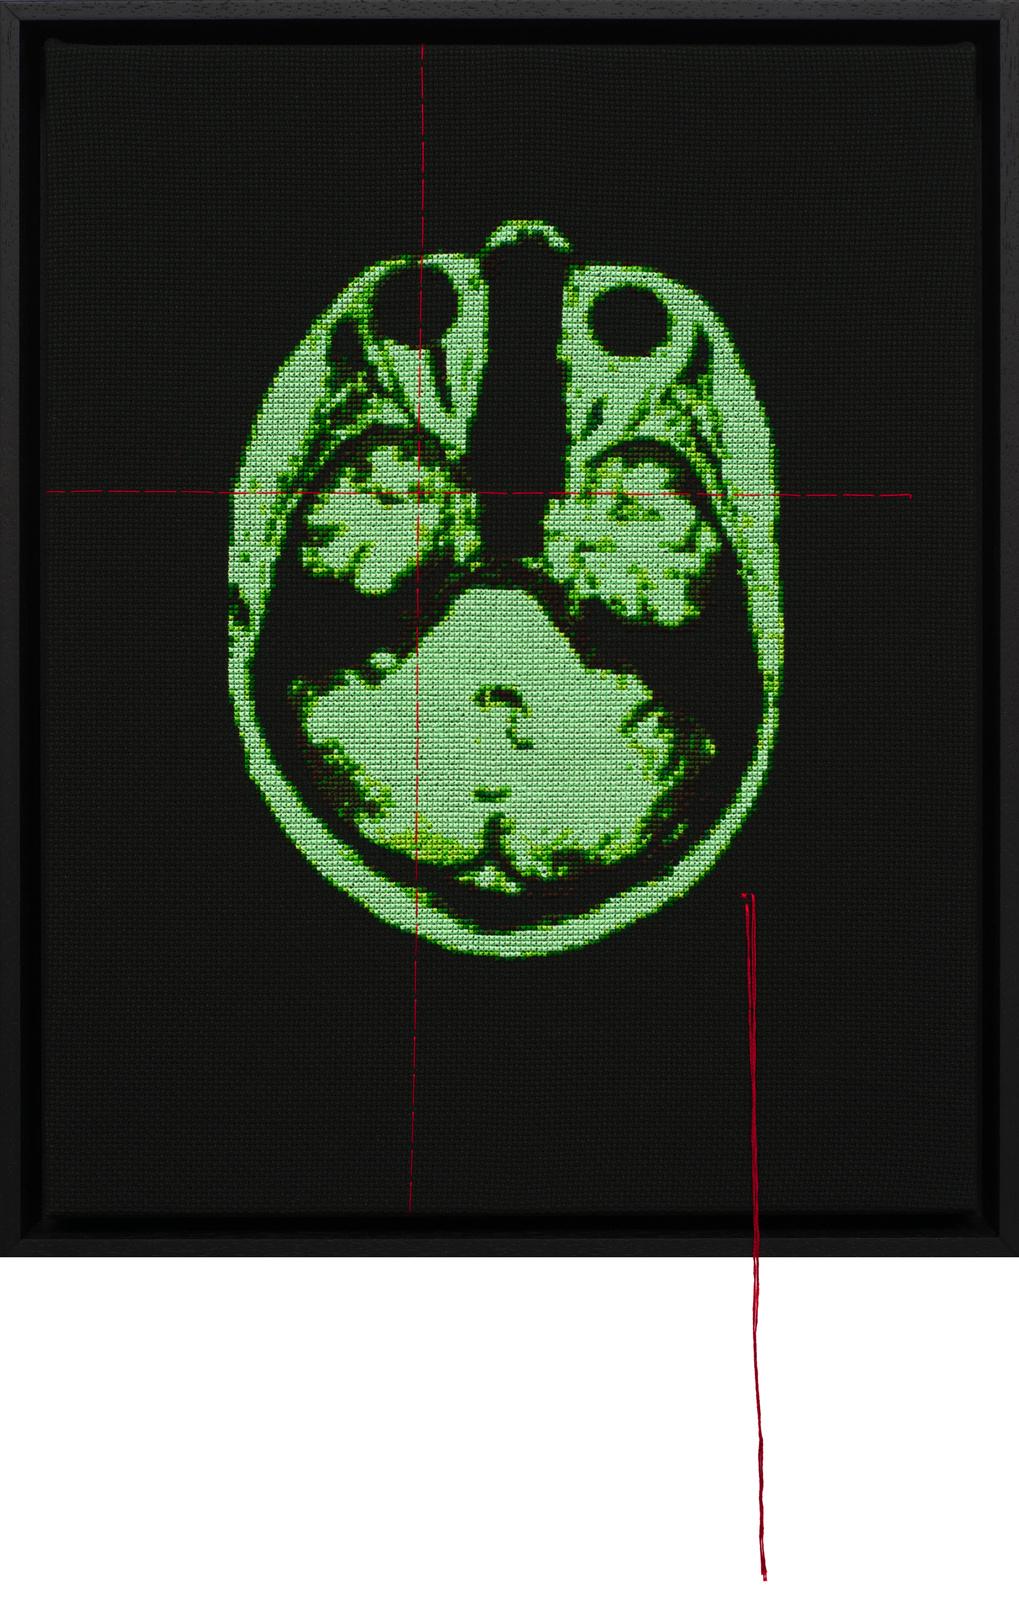 Lada Dedic Self Portrait; Artist's Brain Stranded cotton on aida cloth, 2017 425 x 345 mm  Stitching time: 74 hours 35 minutes    photo Bob Newman